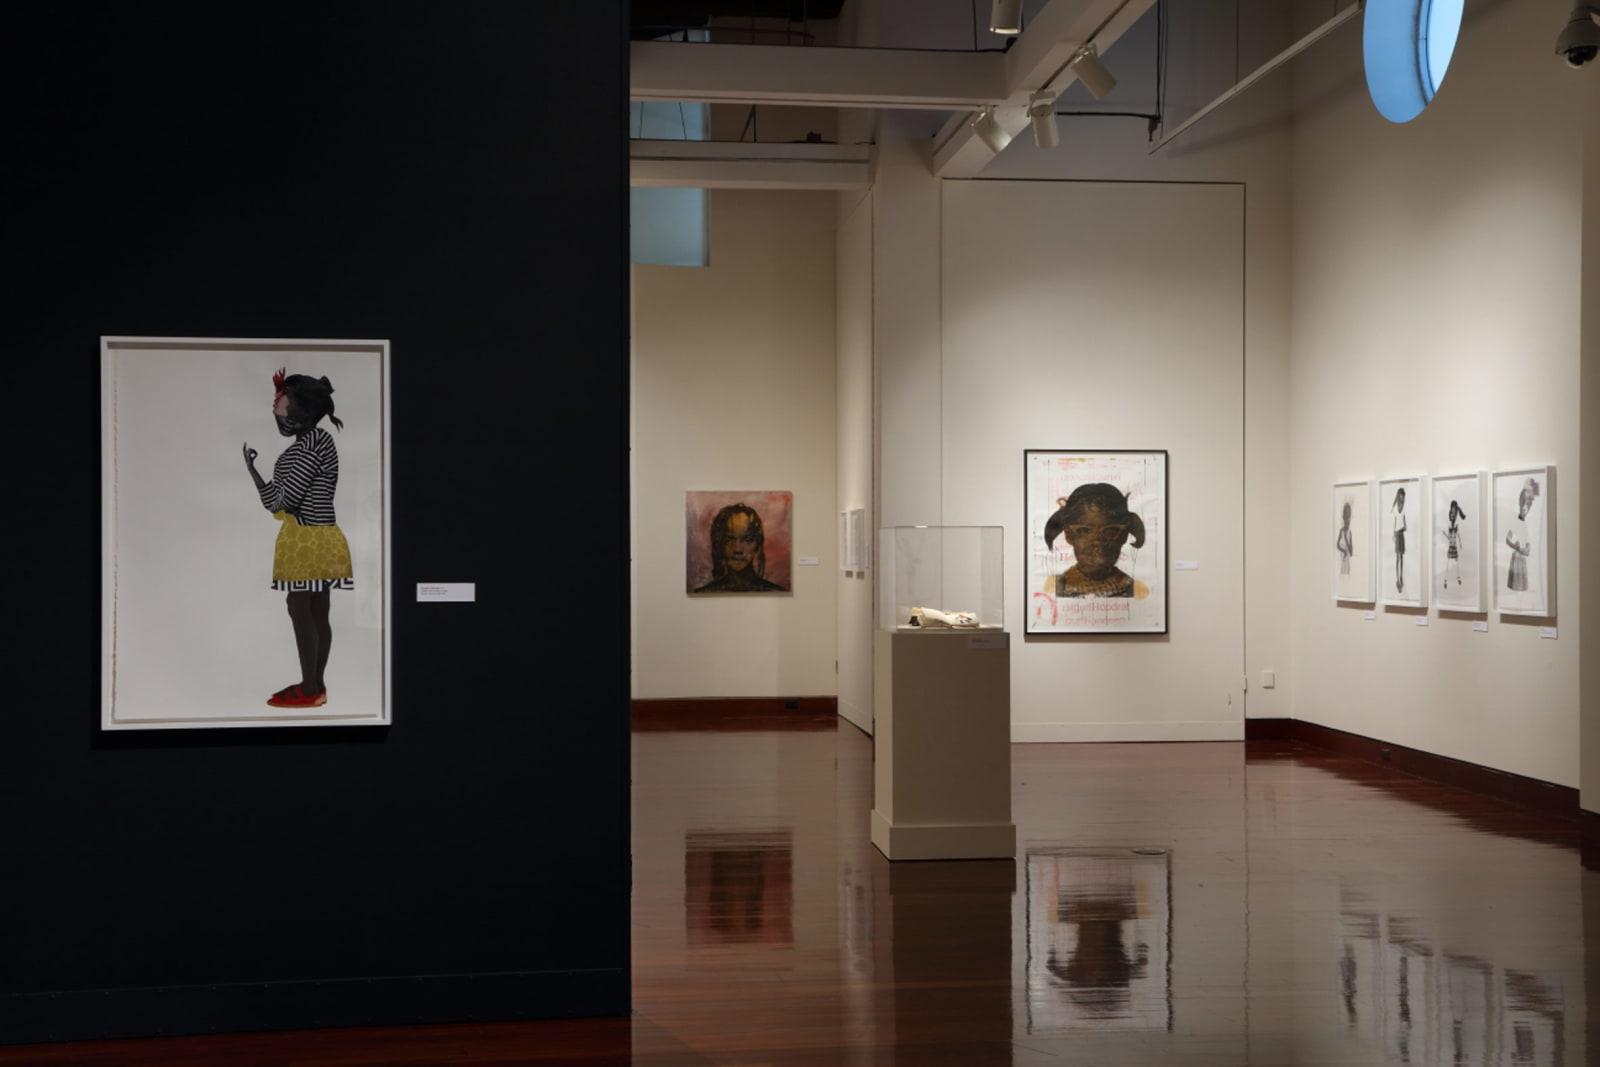 <p>Installation view: 'Deborah Roberts: The Evolution of Mimi', Spelman Museum,Atlanta, GA (2018).</p>